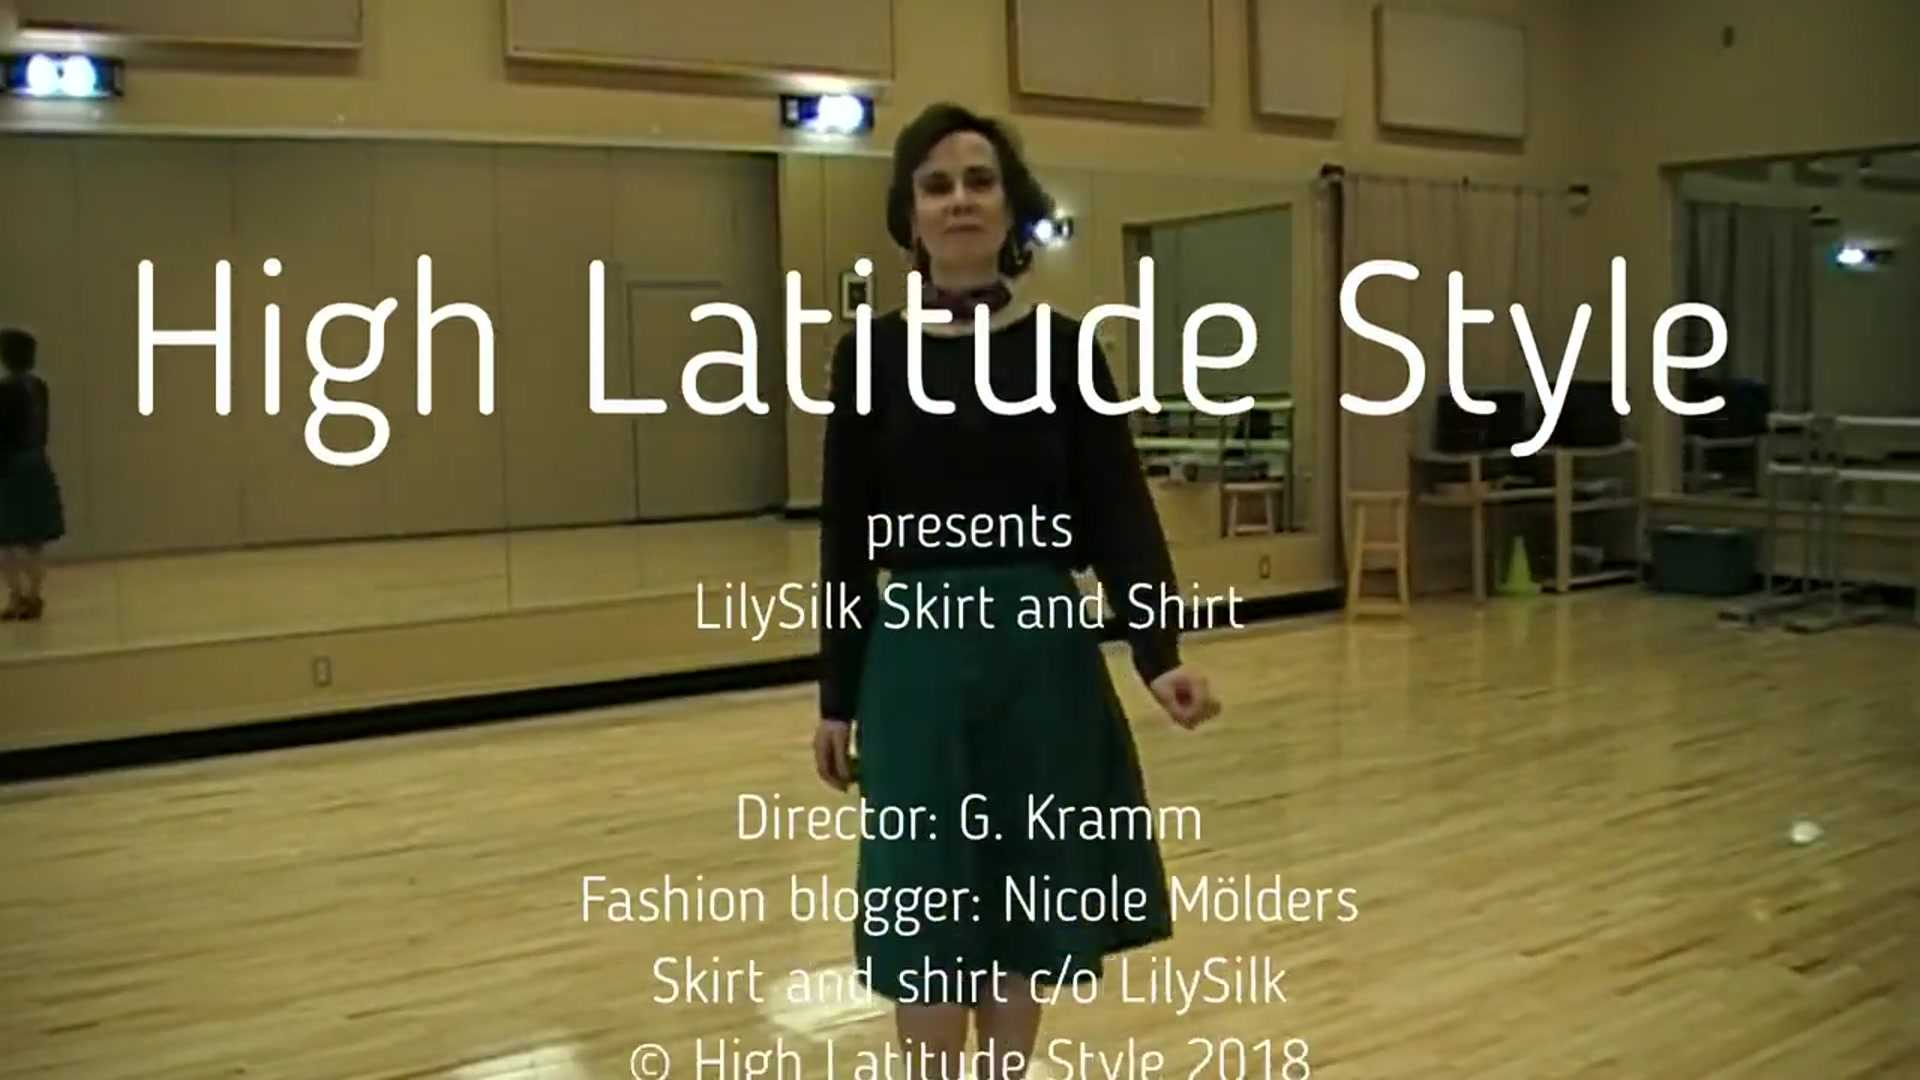 High Latitude Style presents Lilysilk